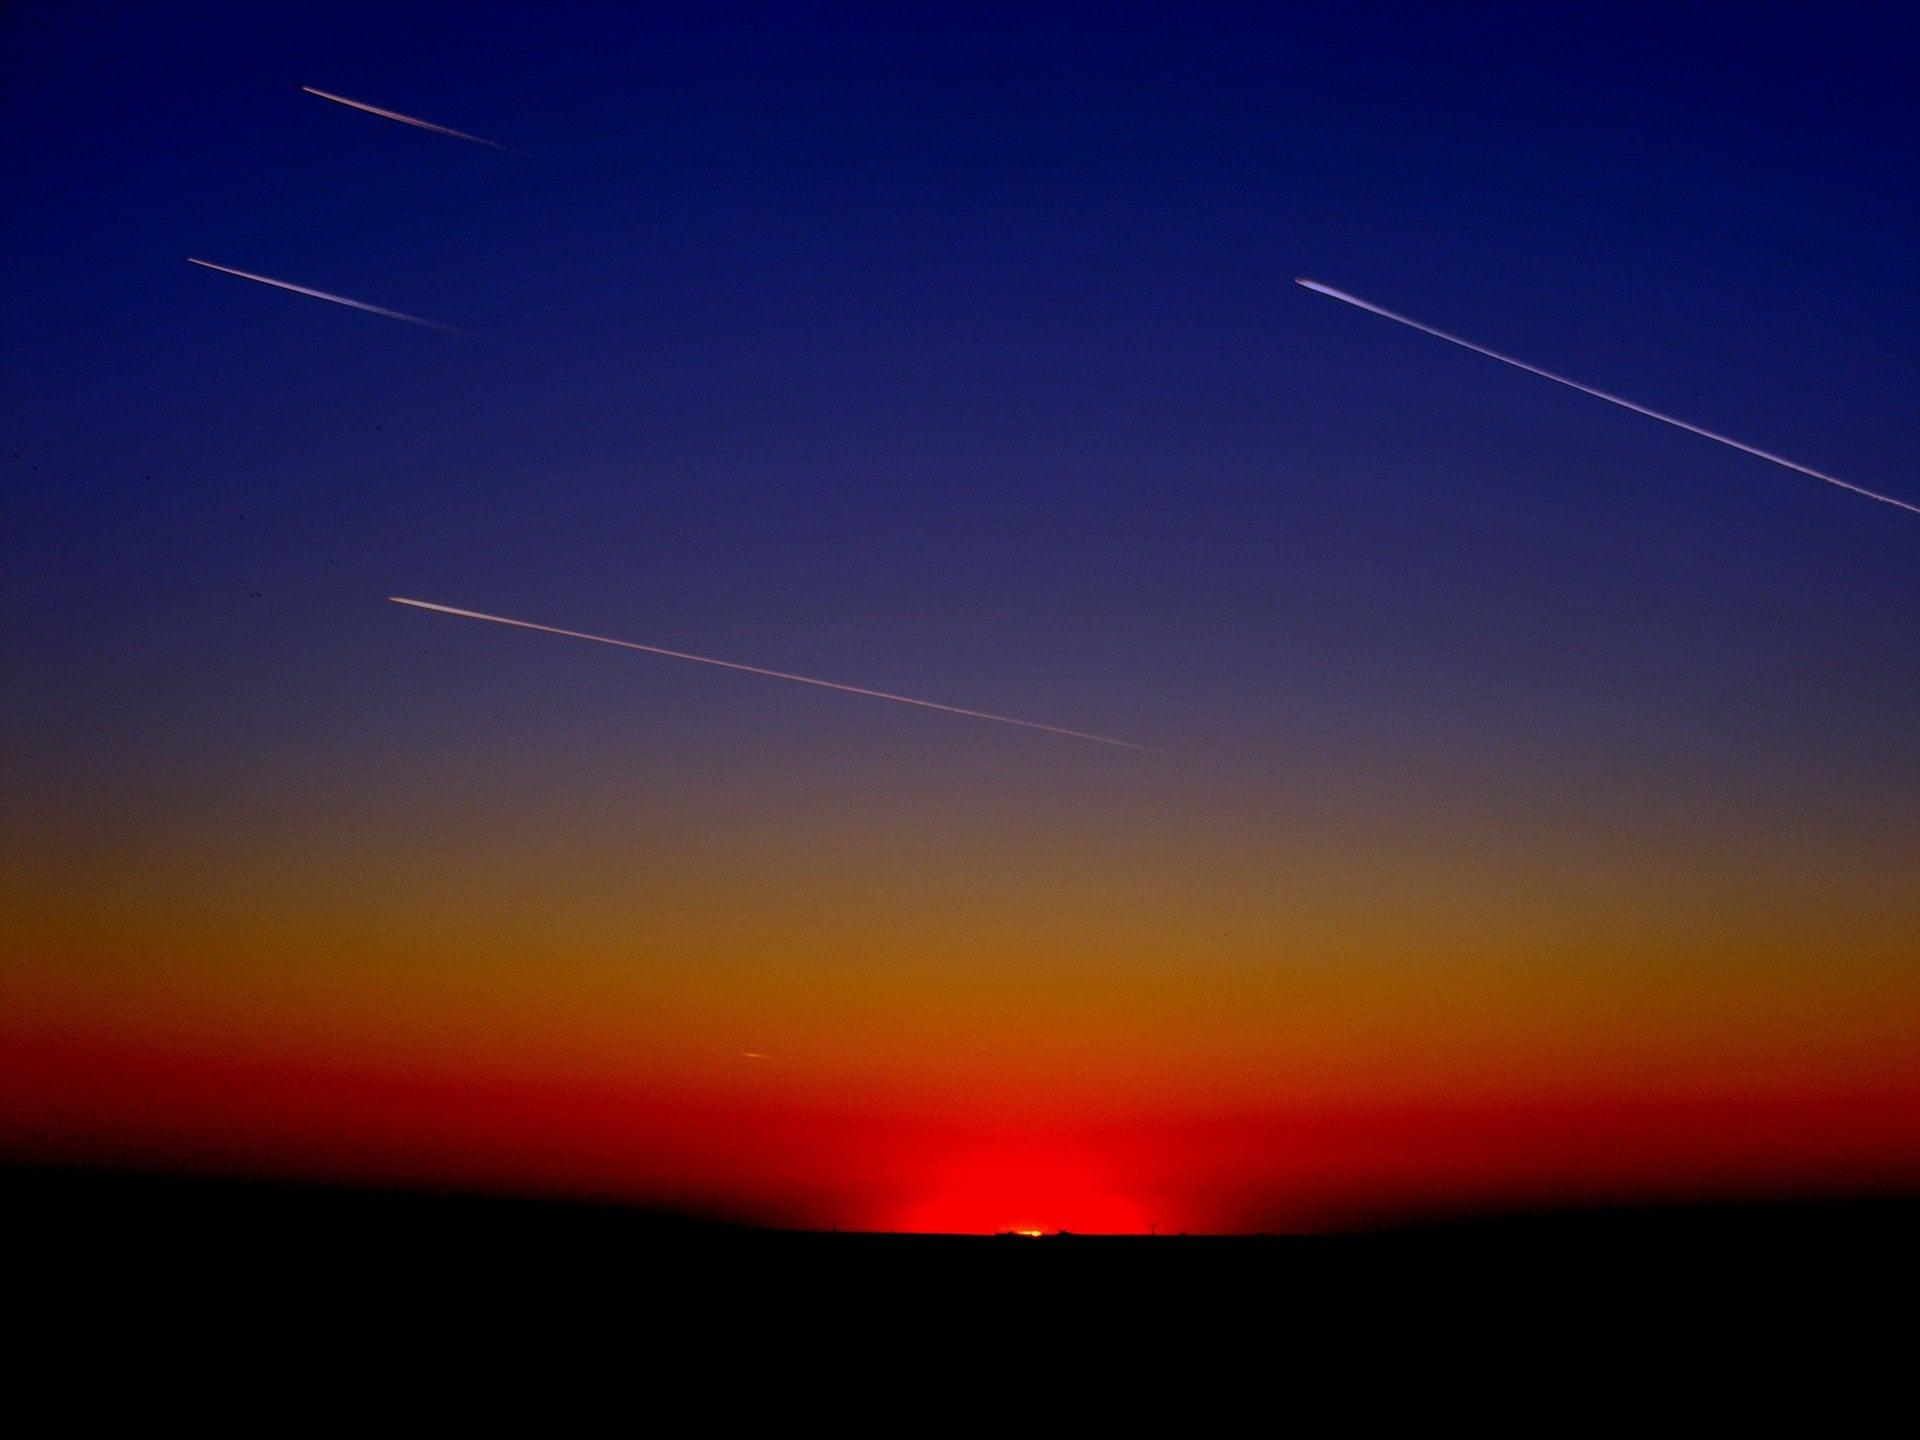 Meteor universe space